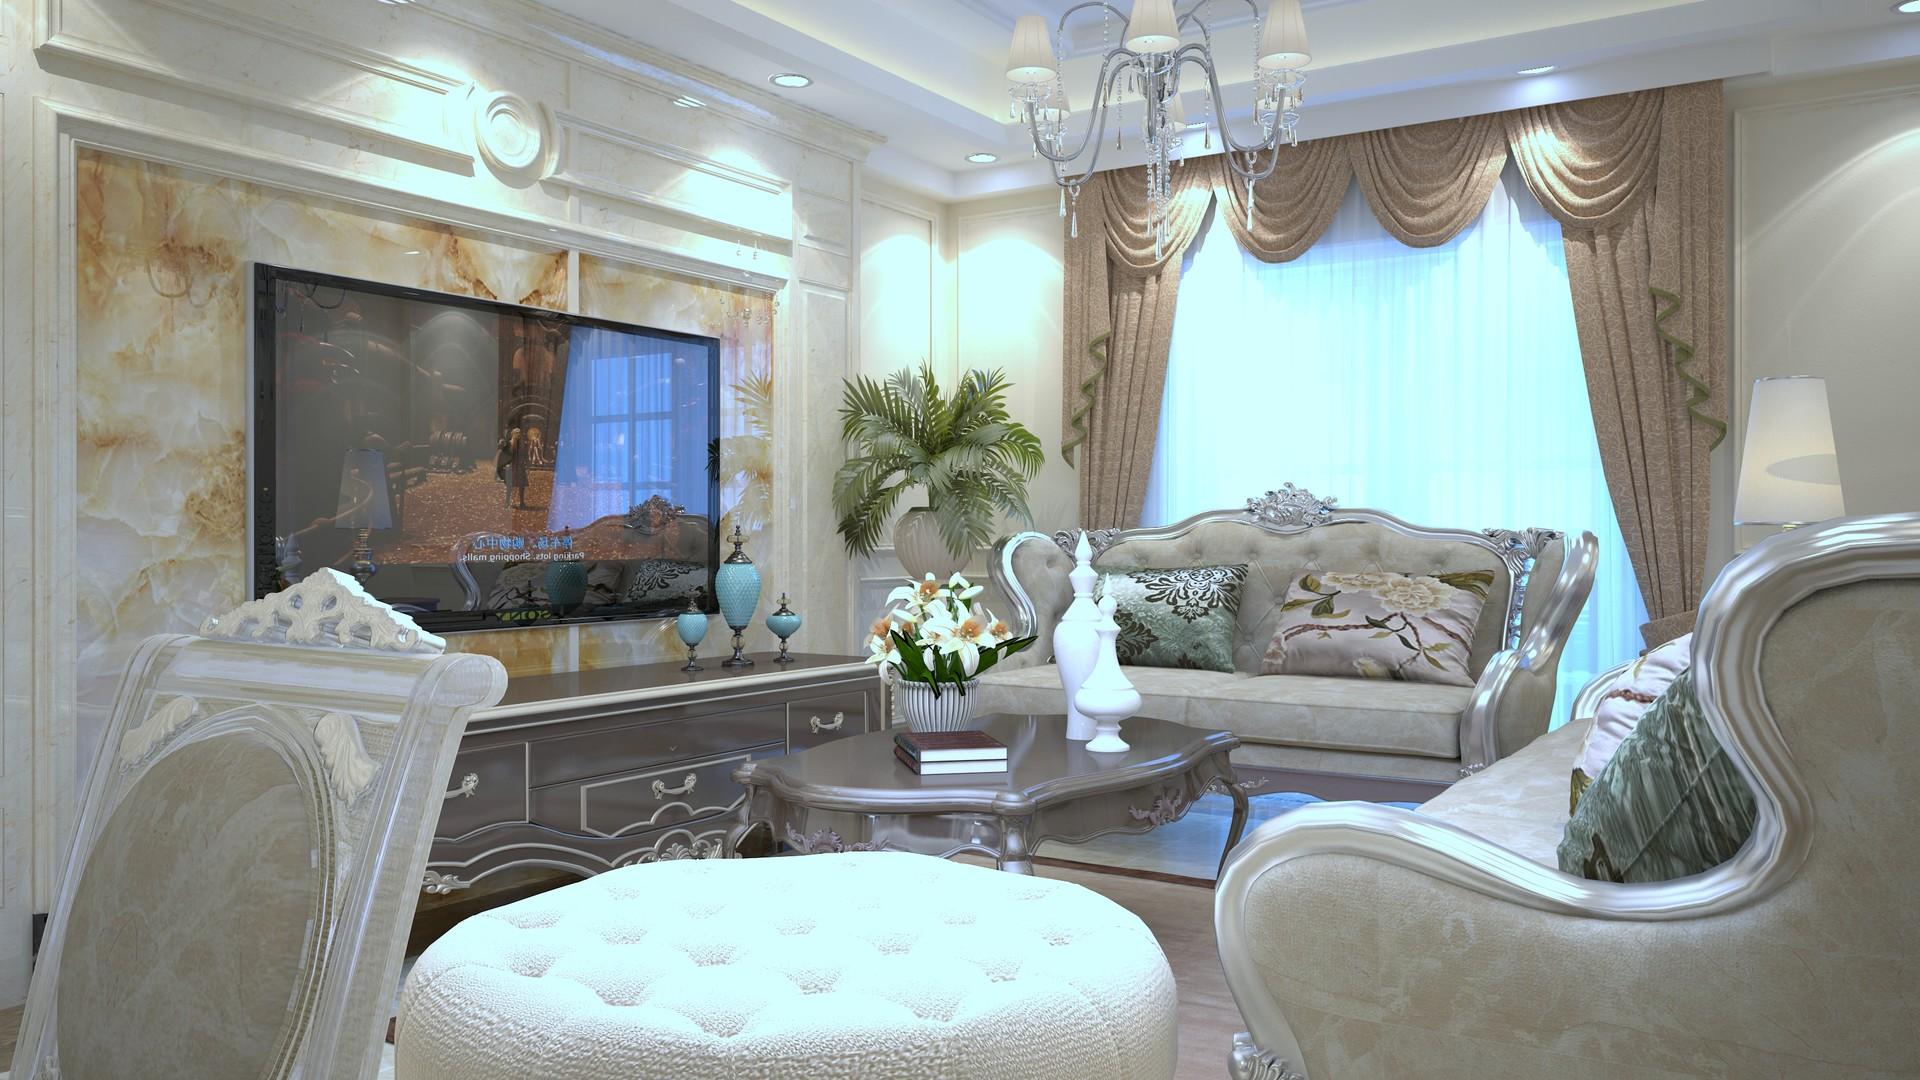 Mohamed Fouad - living room semi classic